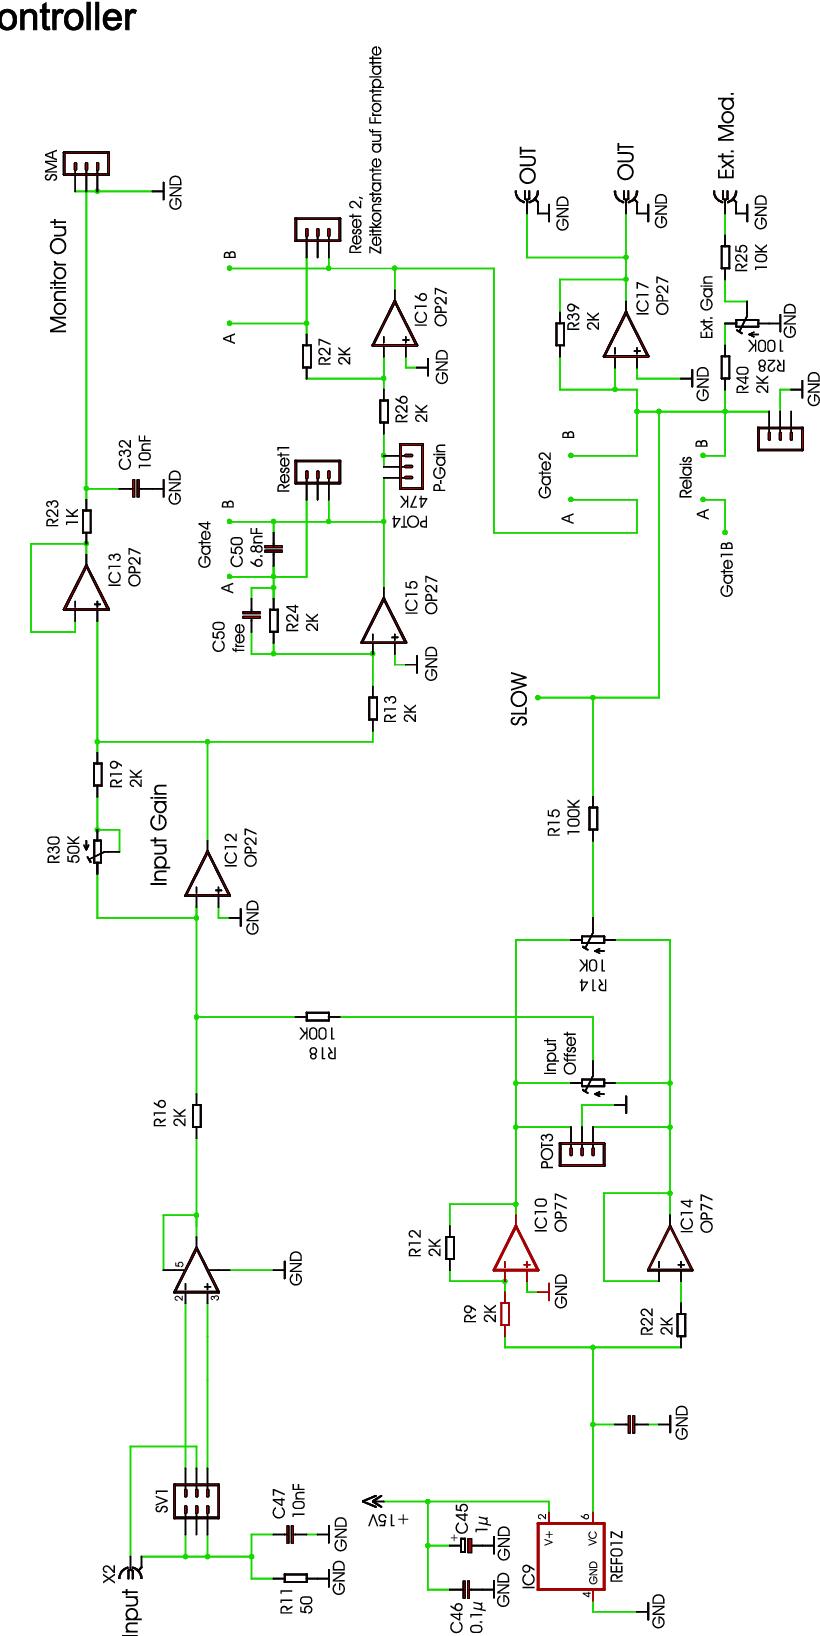 Figure C.3: Lockbox circuit 2